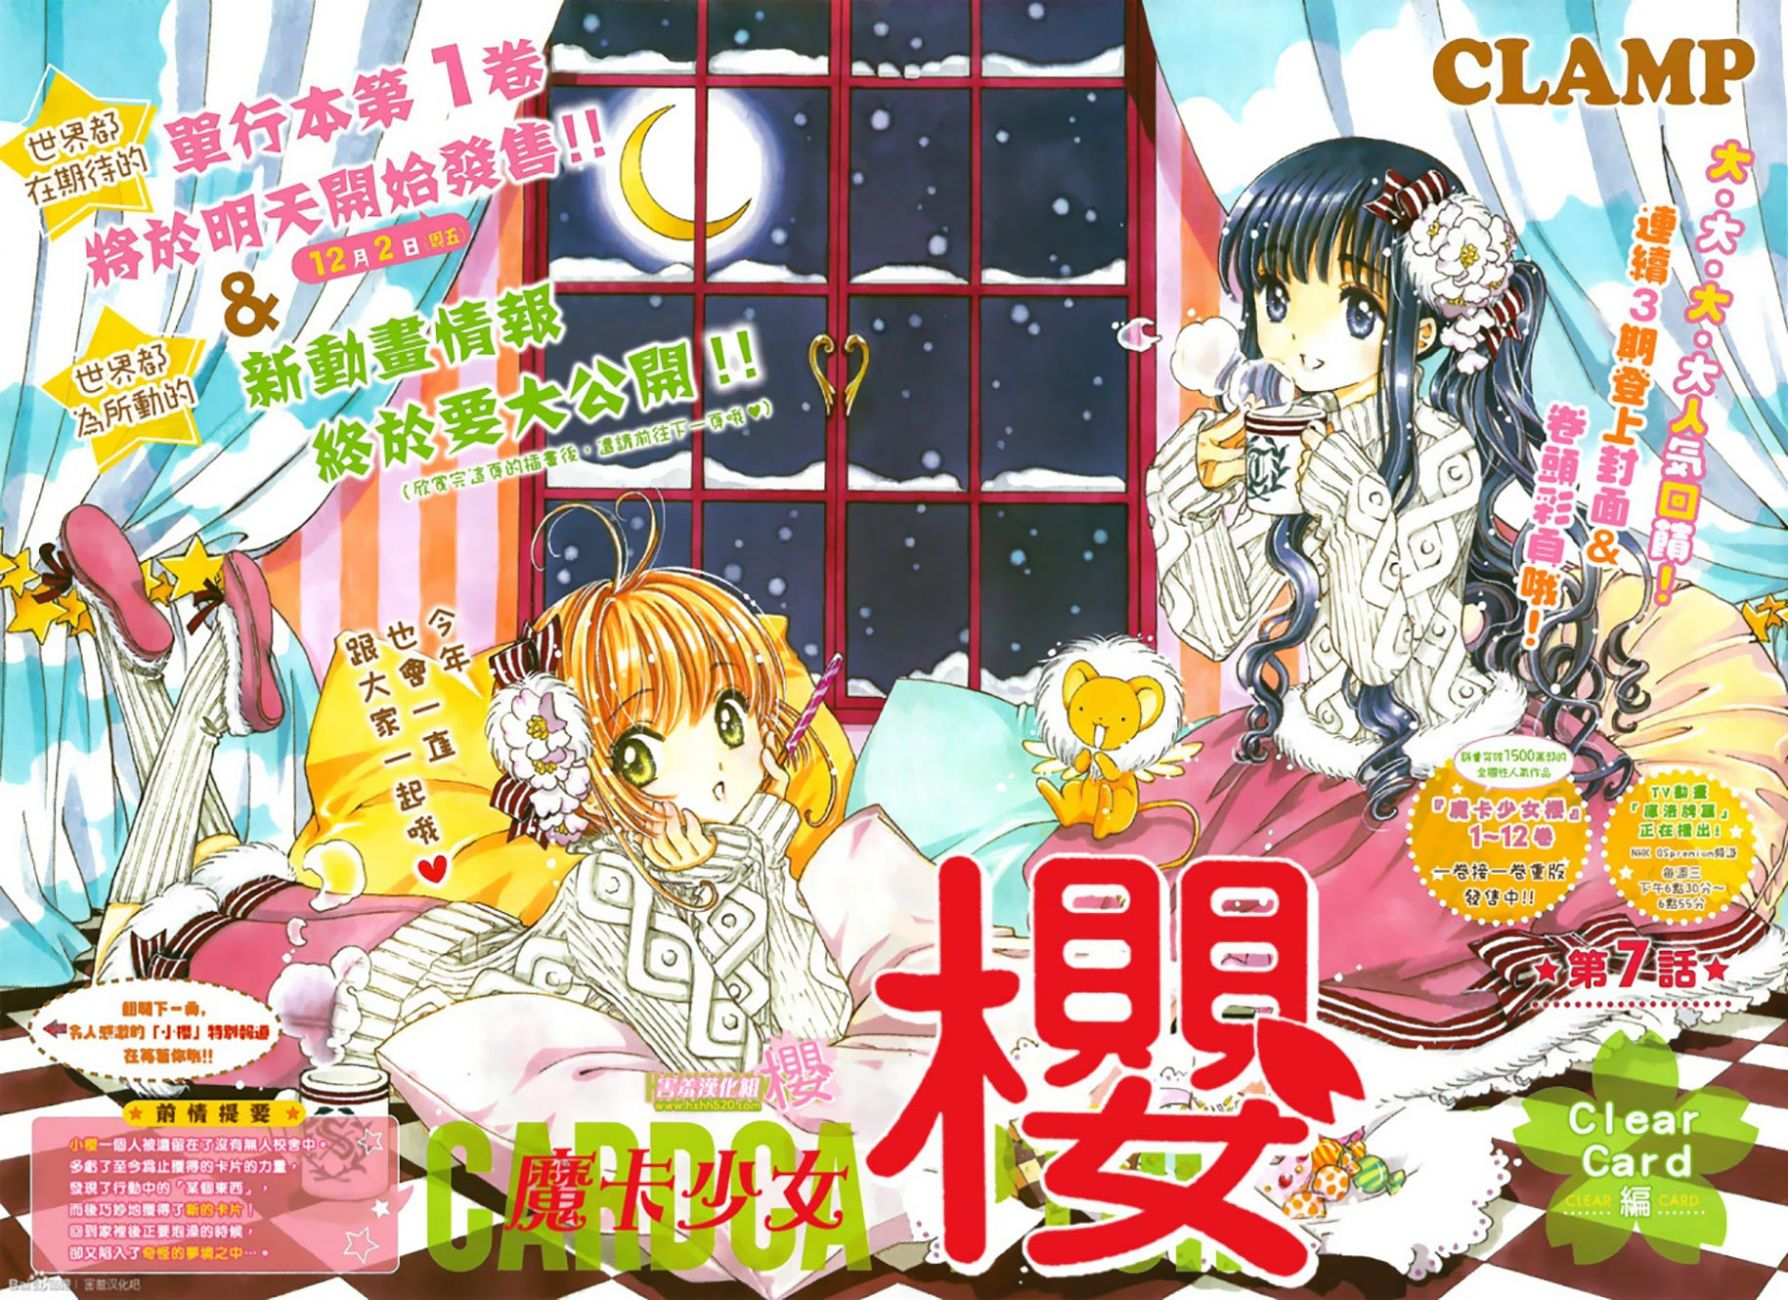 http://c5.ninemanga.com/es_manga/pic2/15/19855/525537/97e49161287e7a4f9b745366e4f9431b.jpg Page 6